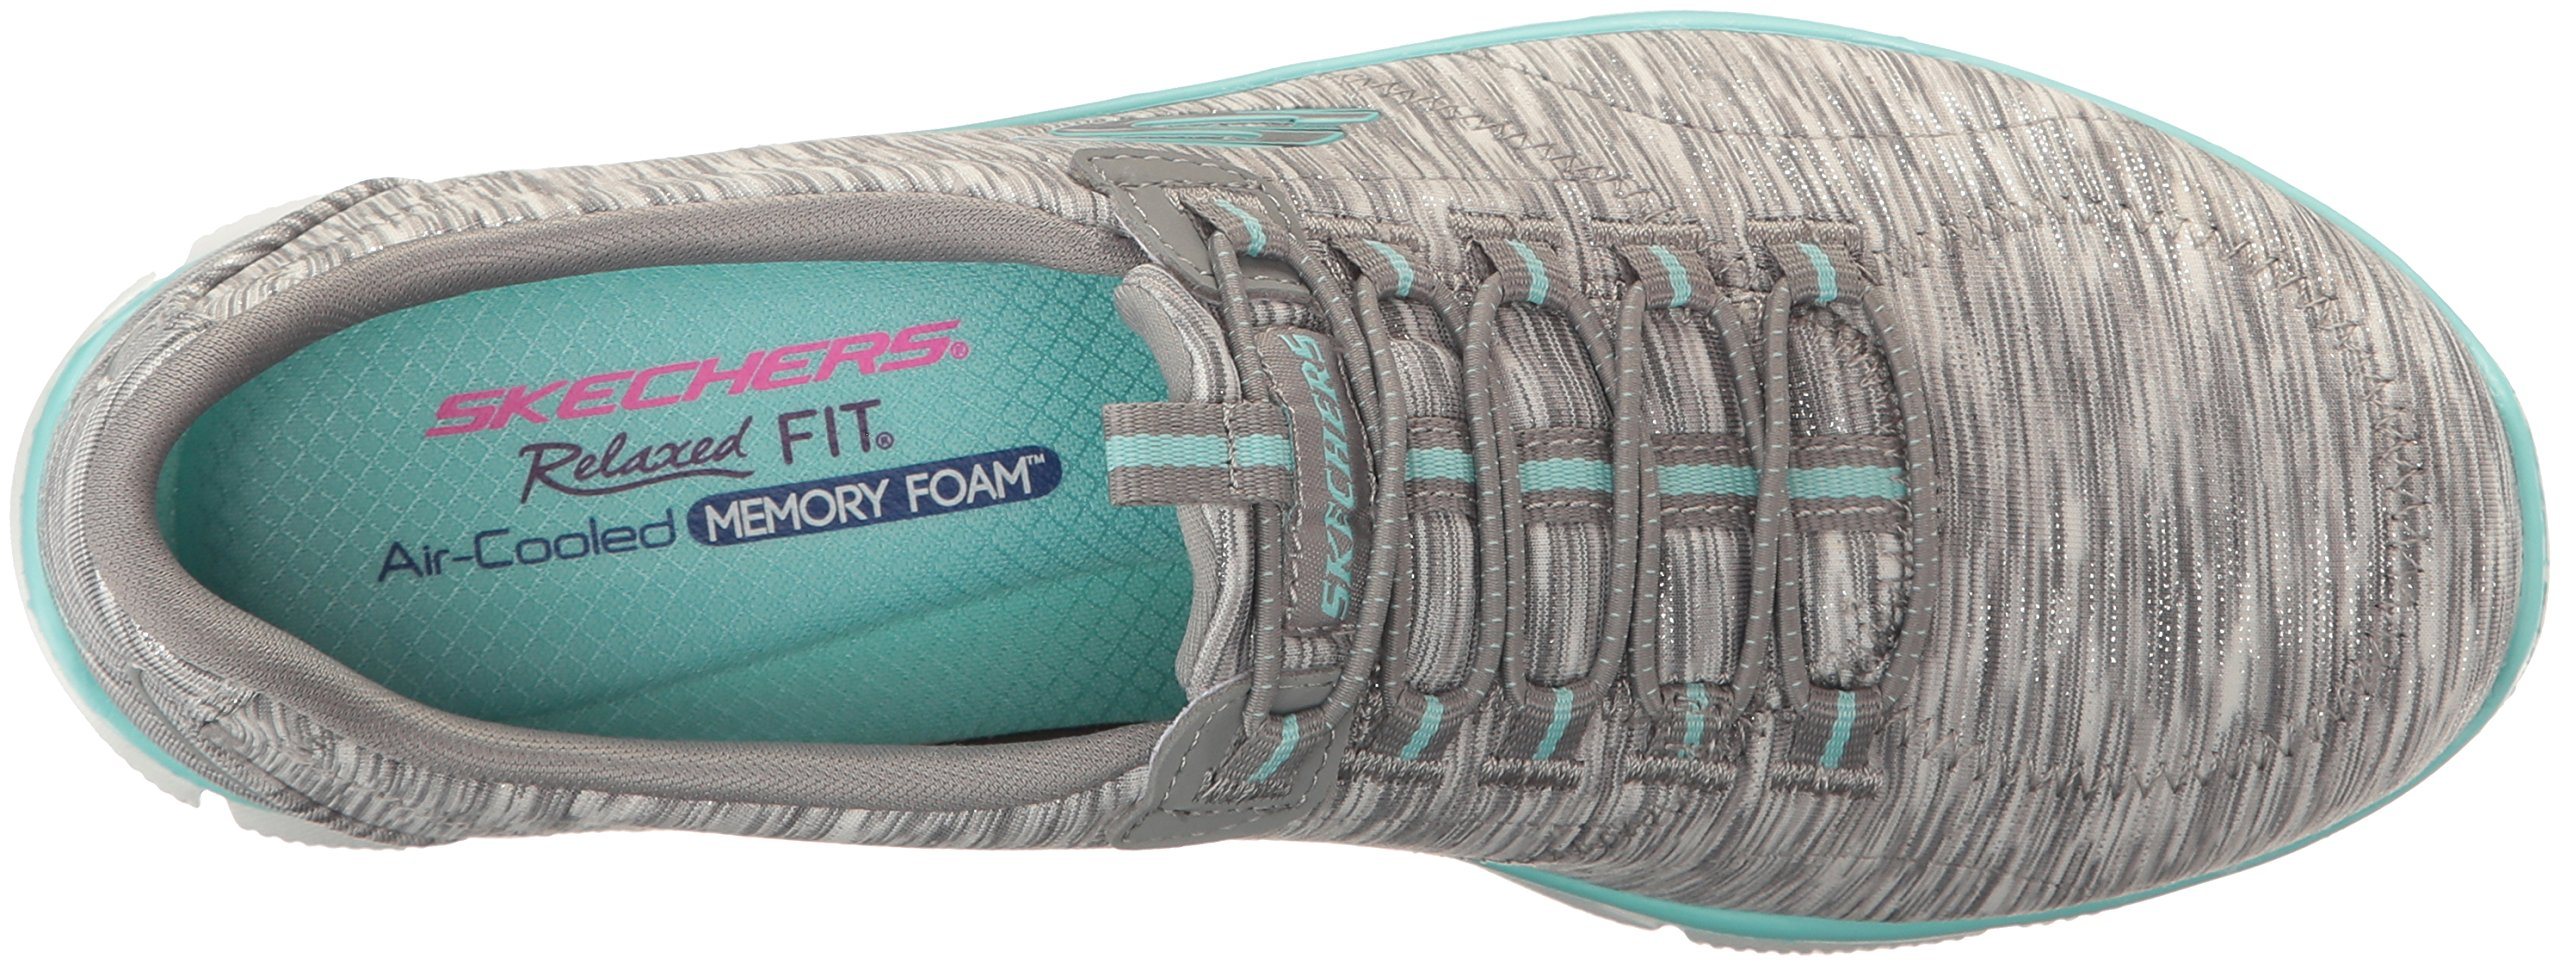 Skechers Women's Sport Empire - Rock Around Relaxed Fit Fashion Sneaker, Gray/Light Blue, 9 B(M) US by Skechers (Image #8)